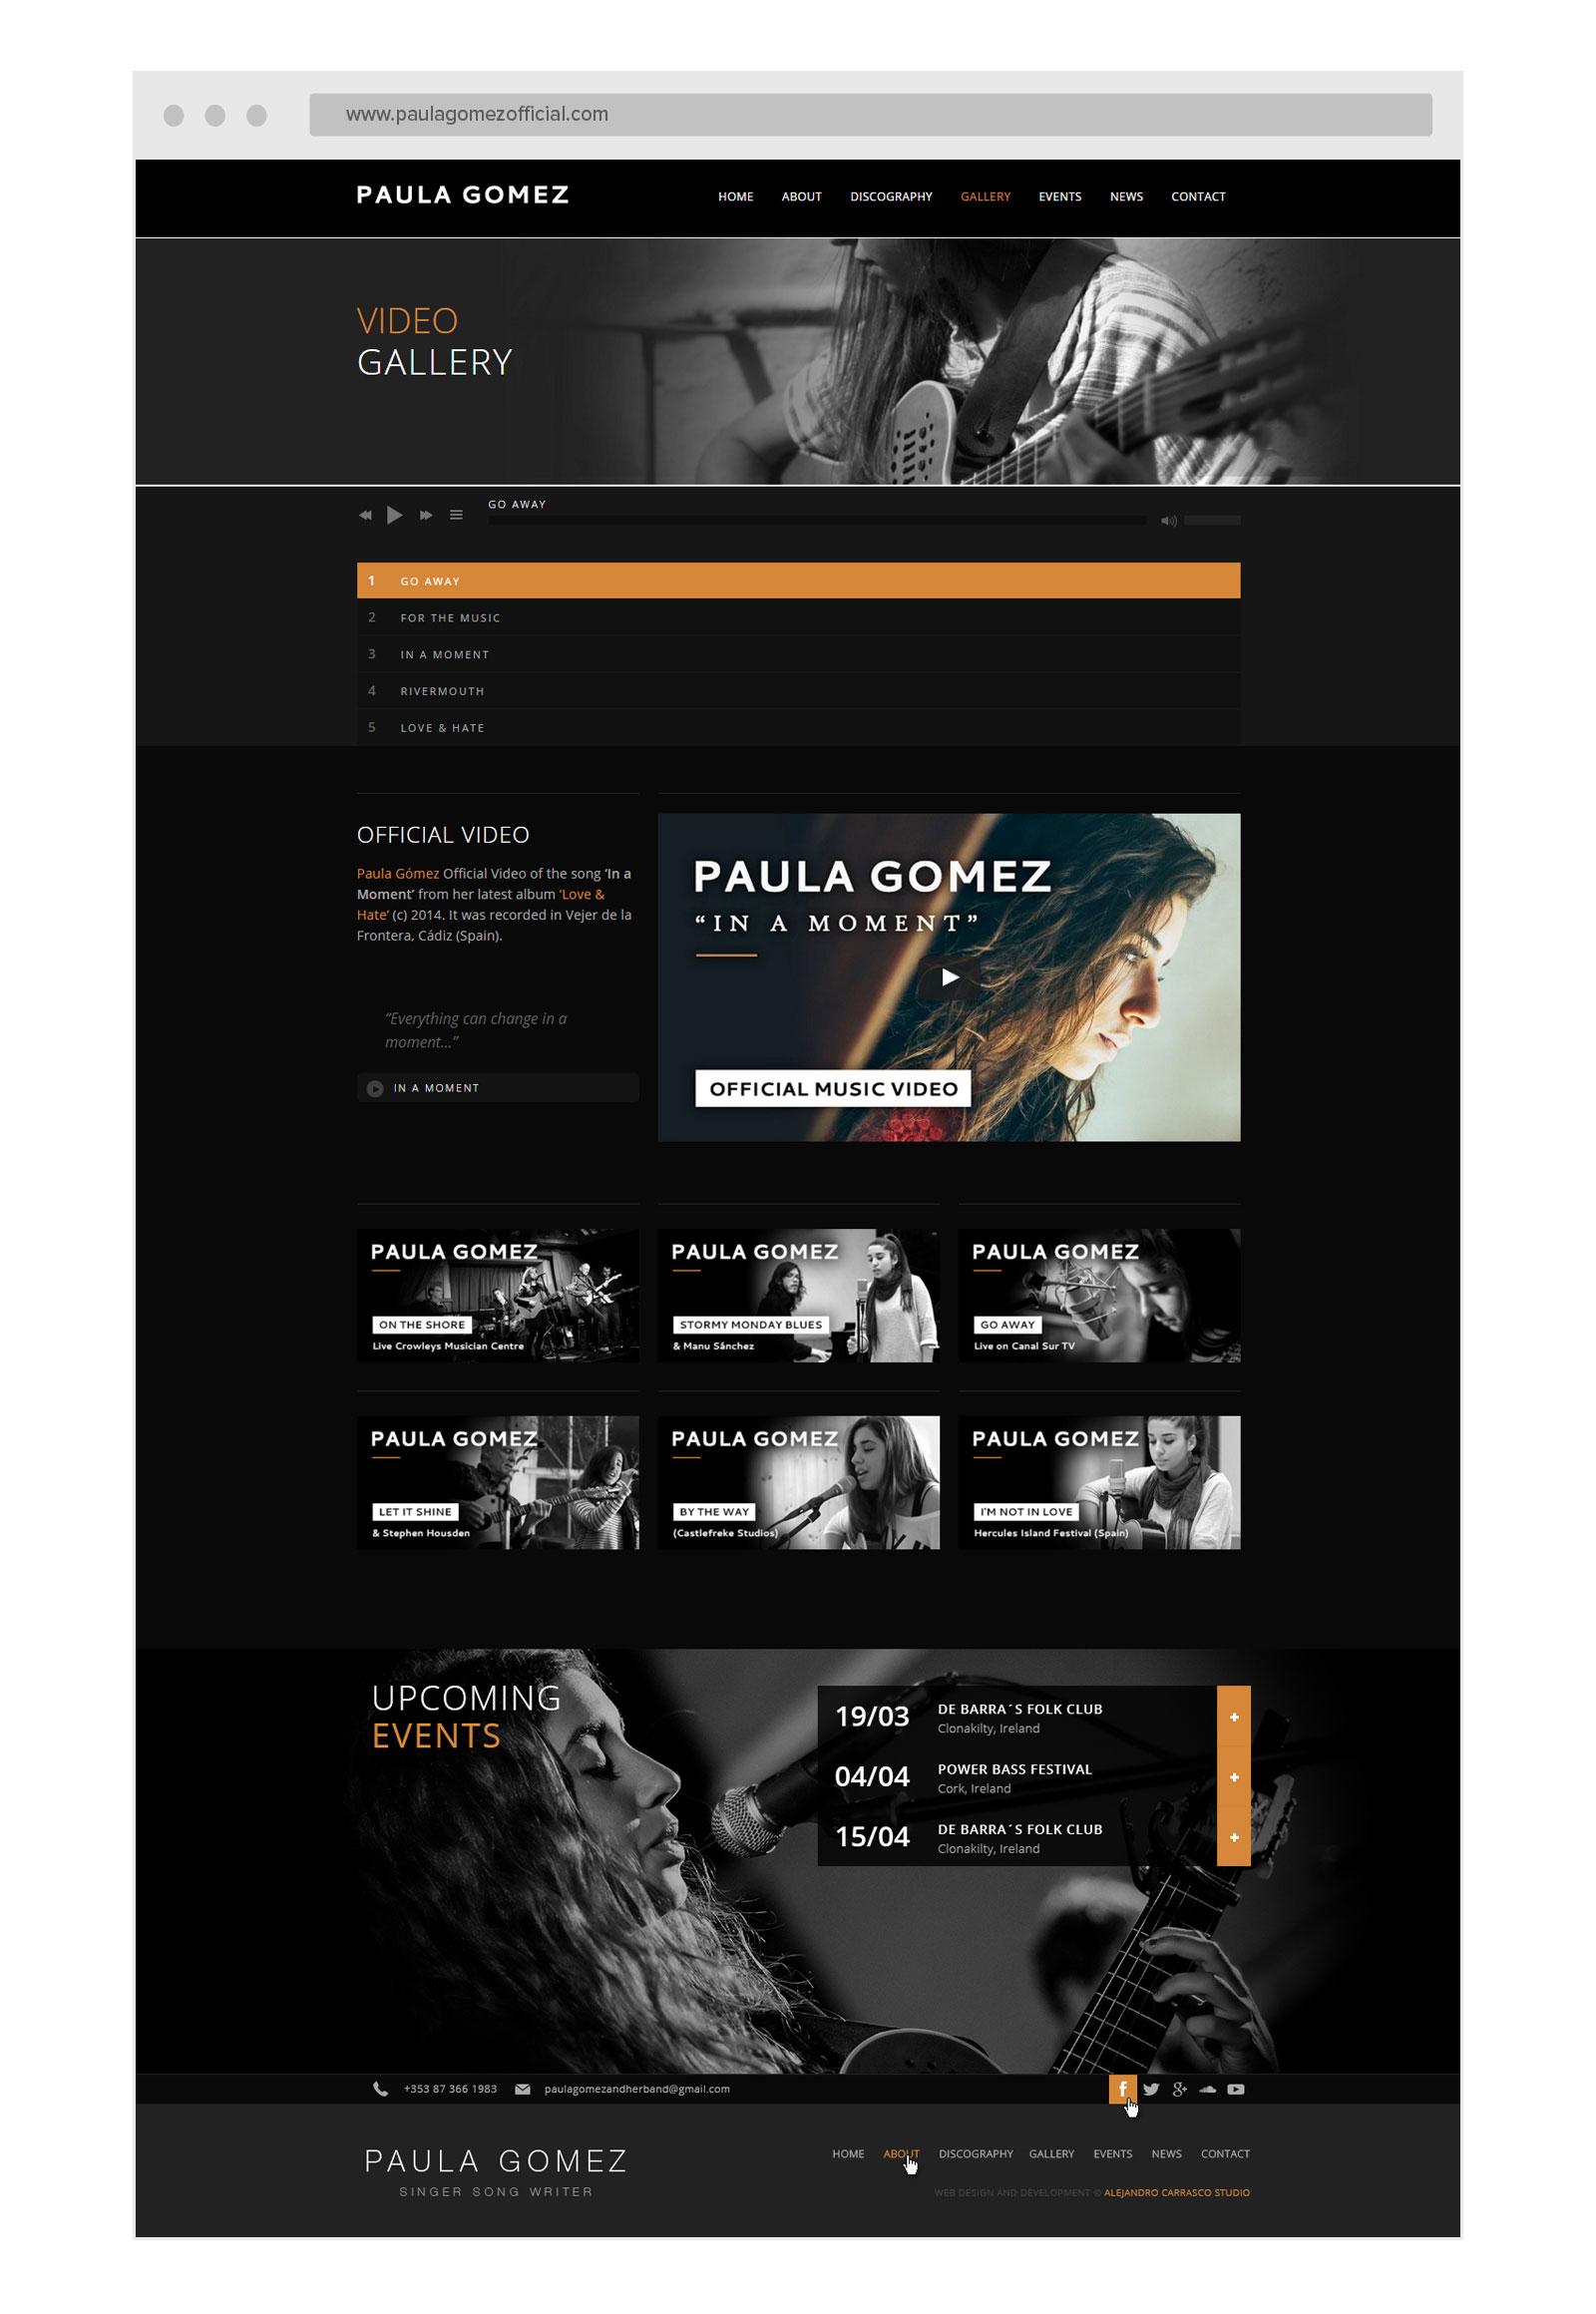 paula-gomez-website-04.jpg